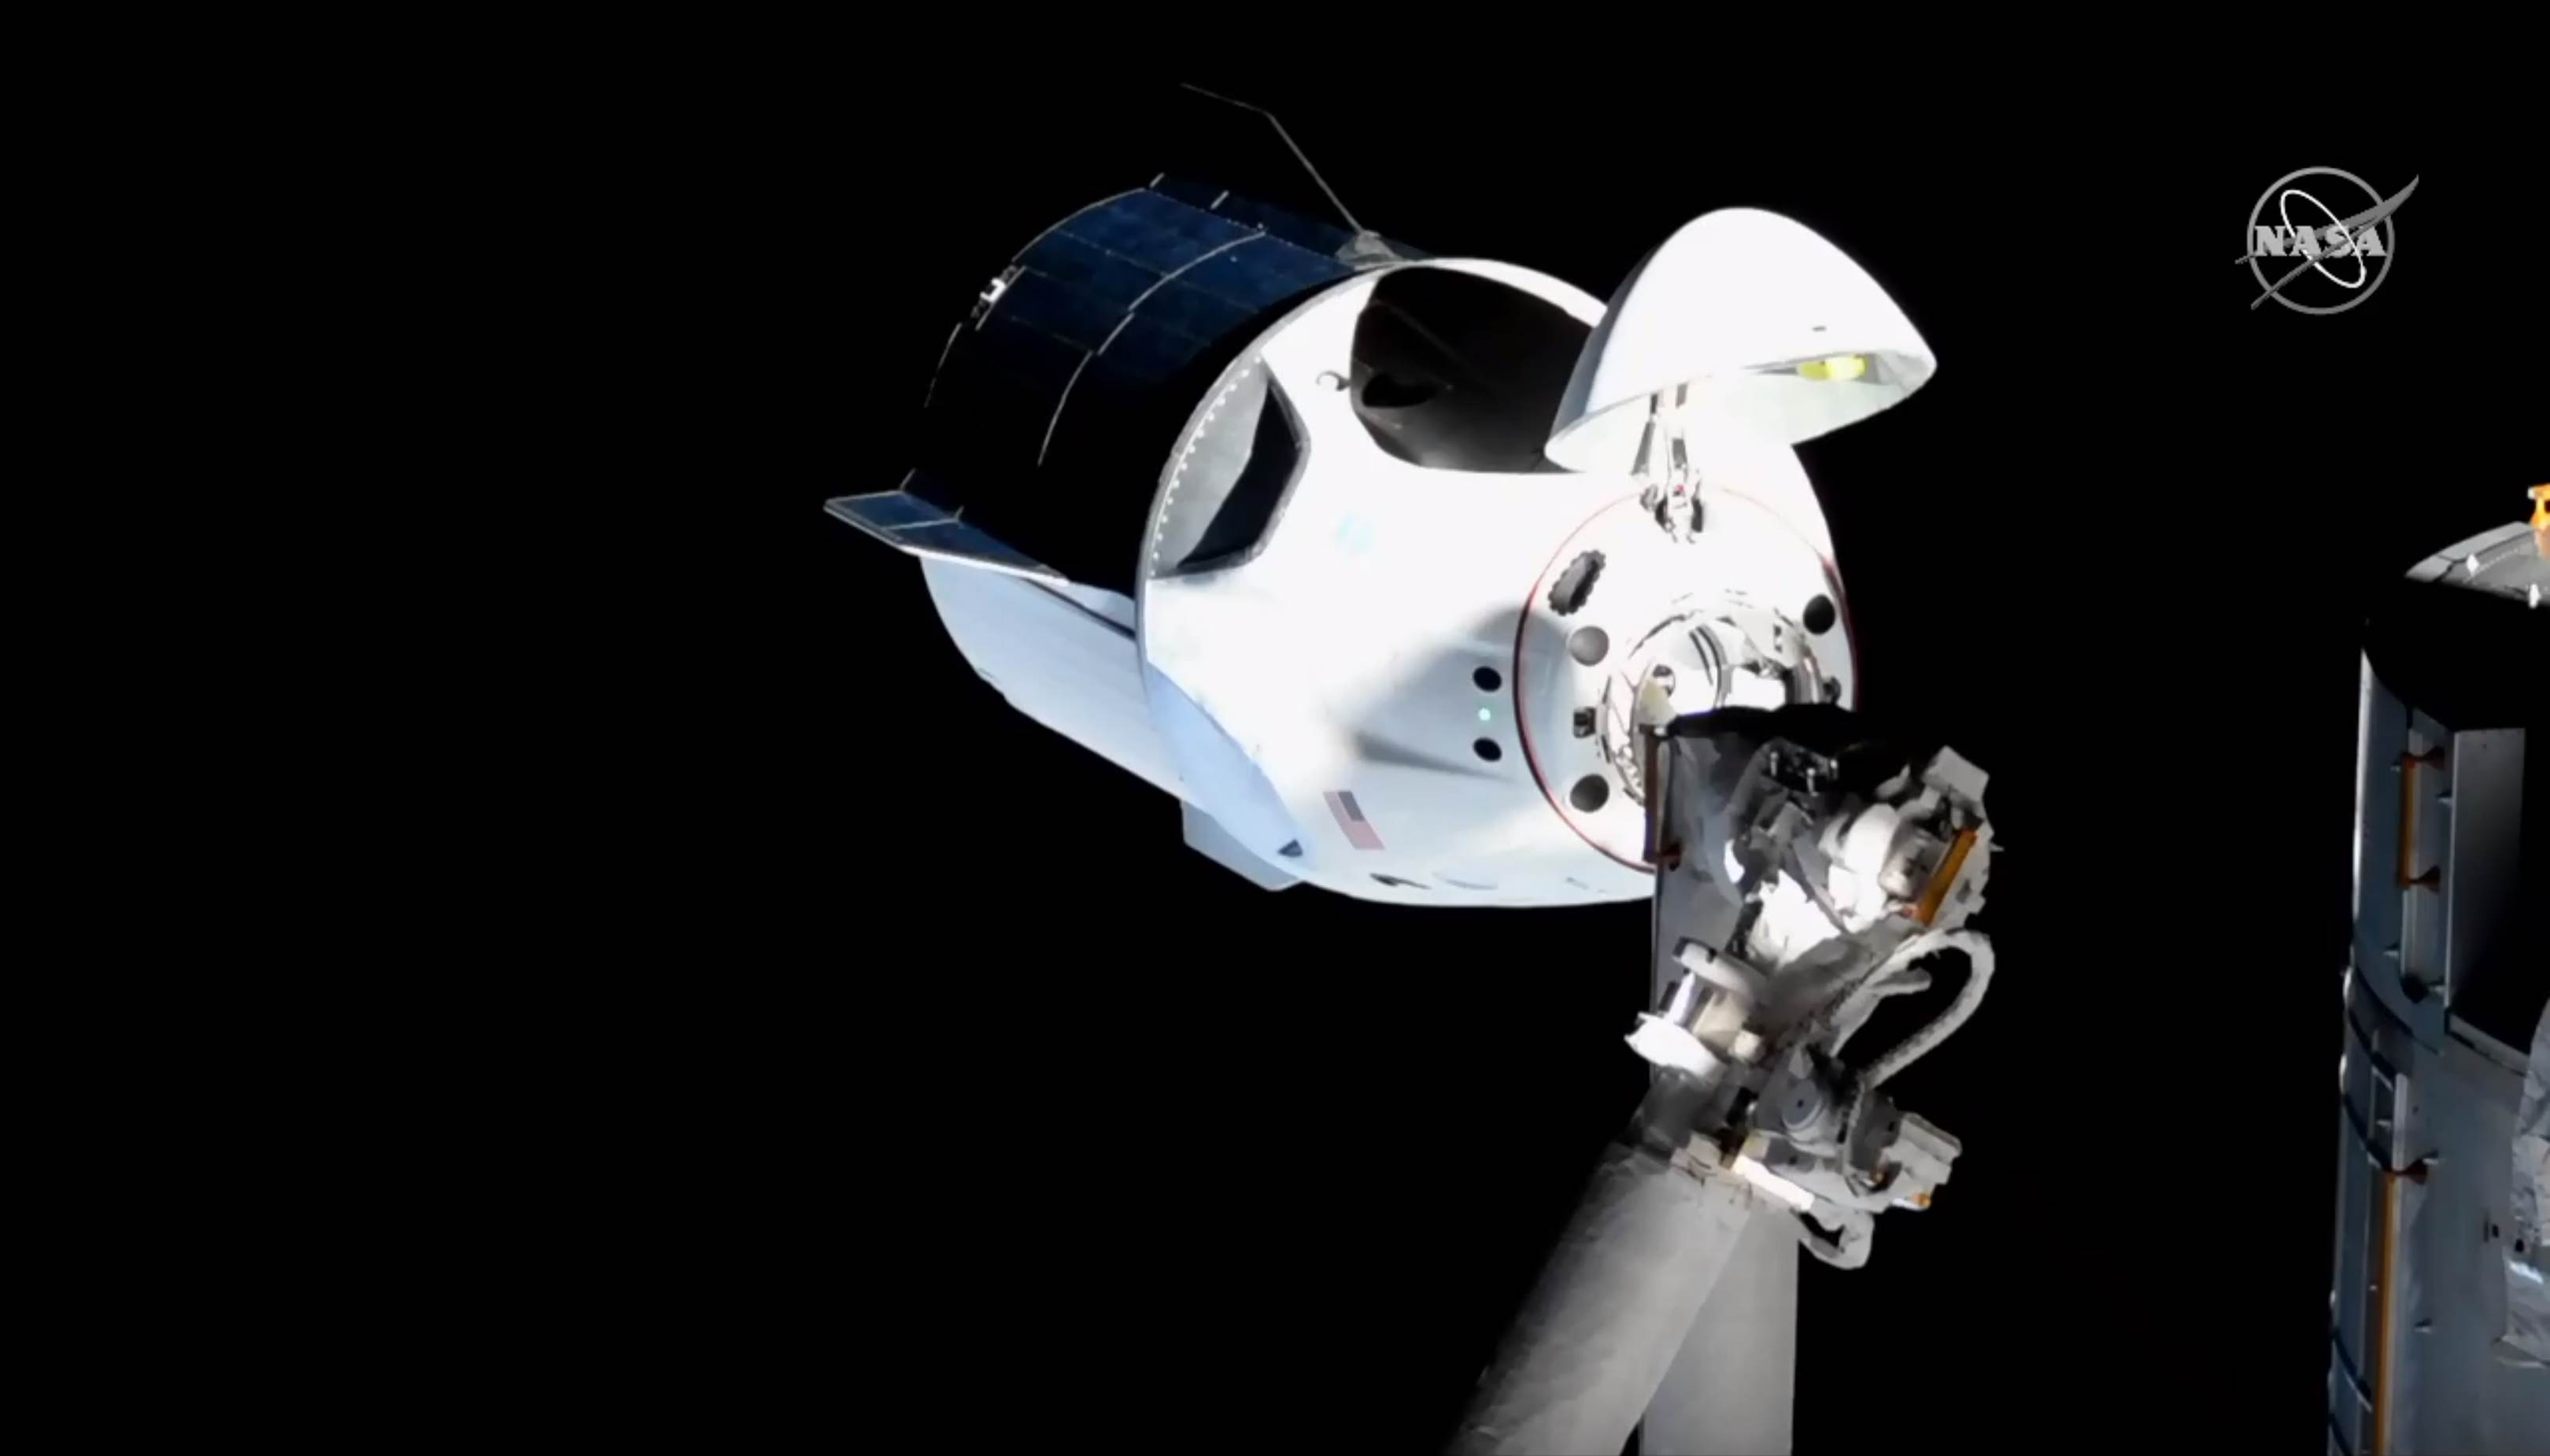 Crew Dragon DM-1 ISS arrival 030319 (NASA) 5